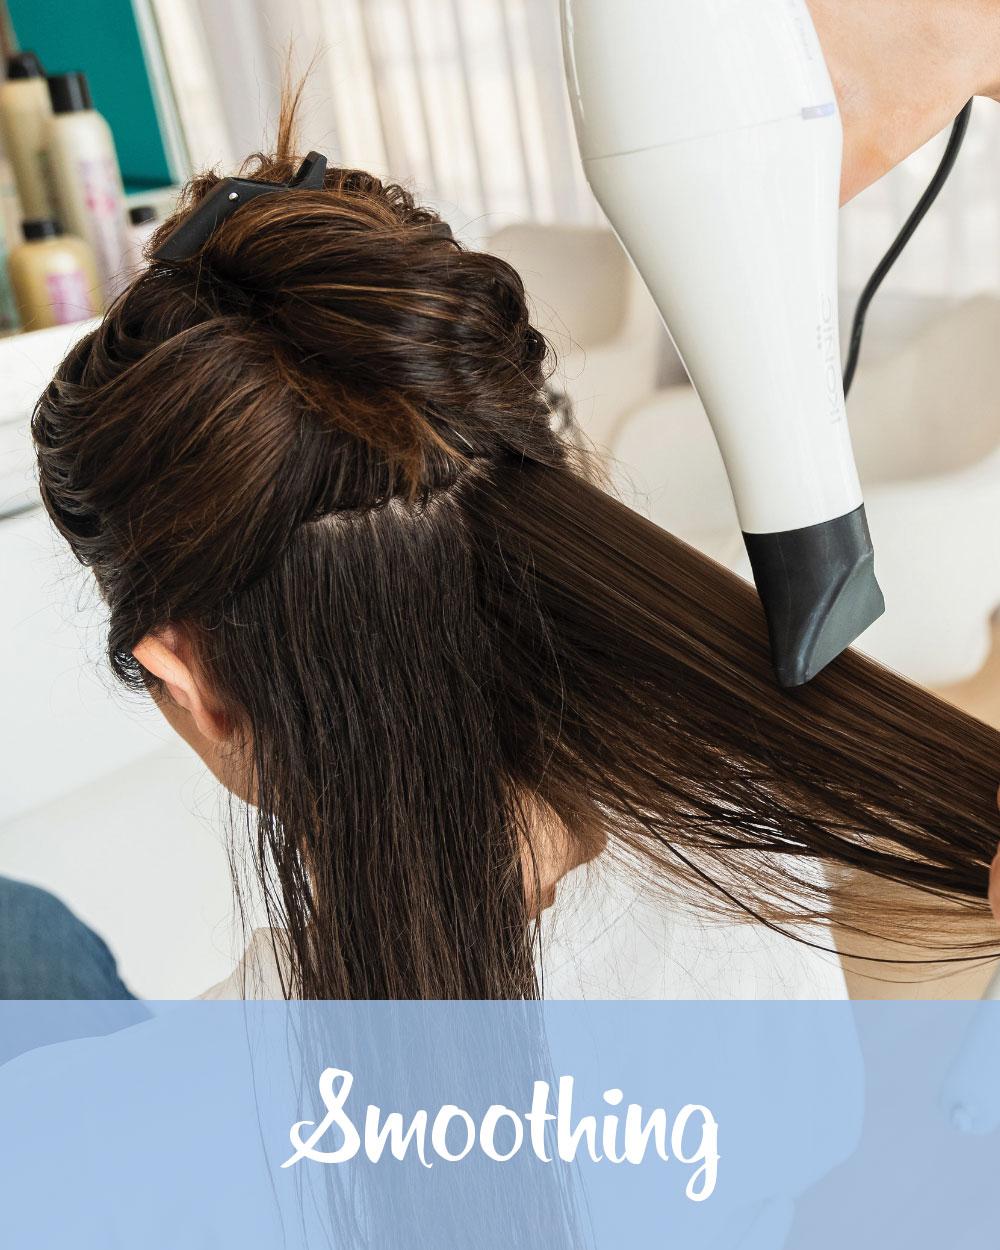 BeBar_HAIR-TREATMENT_1000x1250px_SMOOTHING.jpg